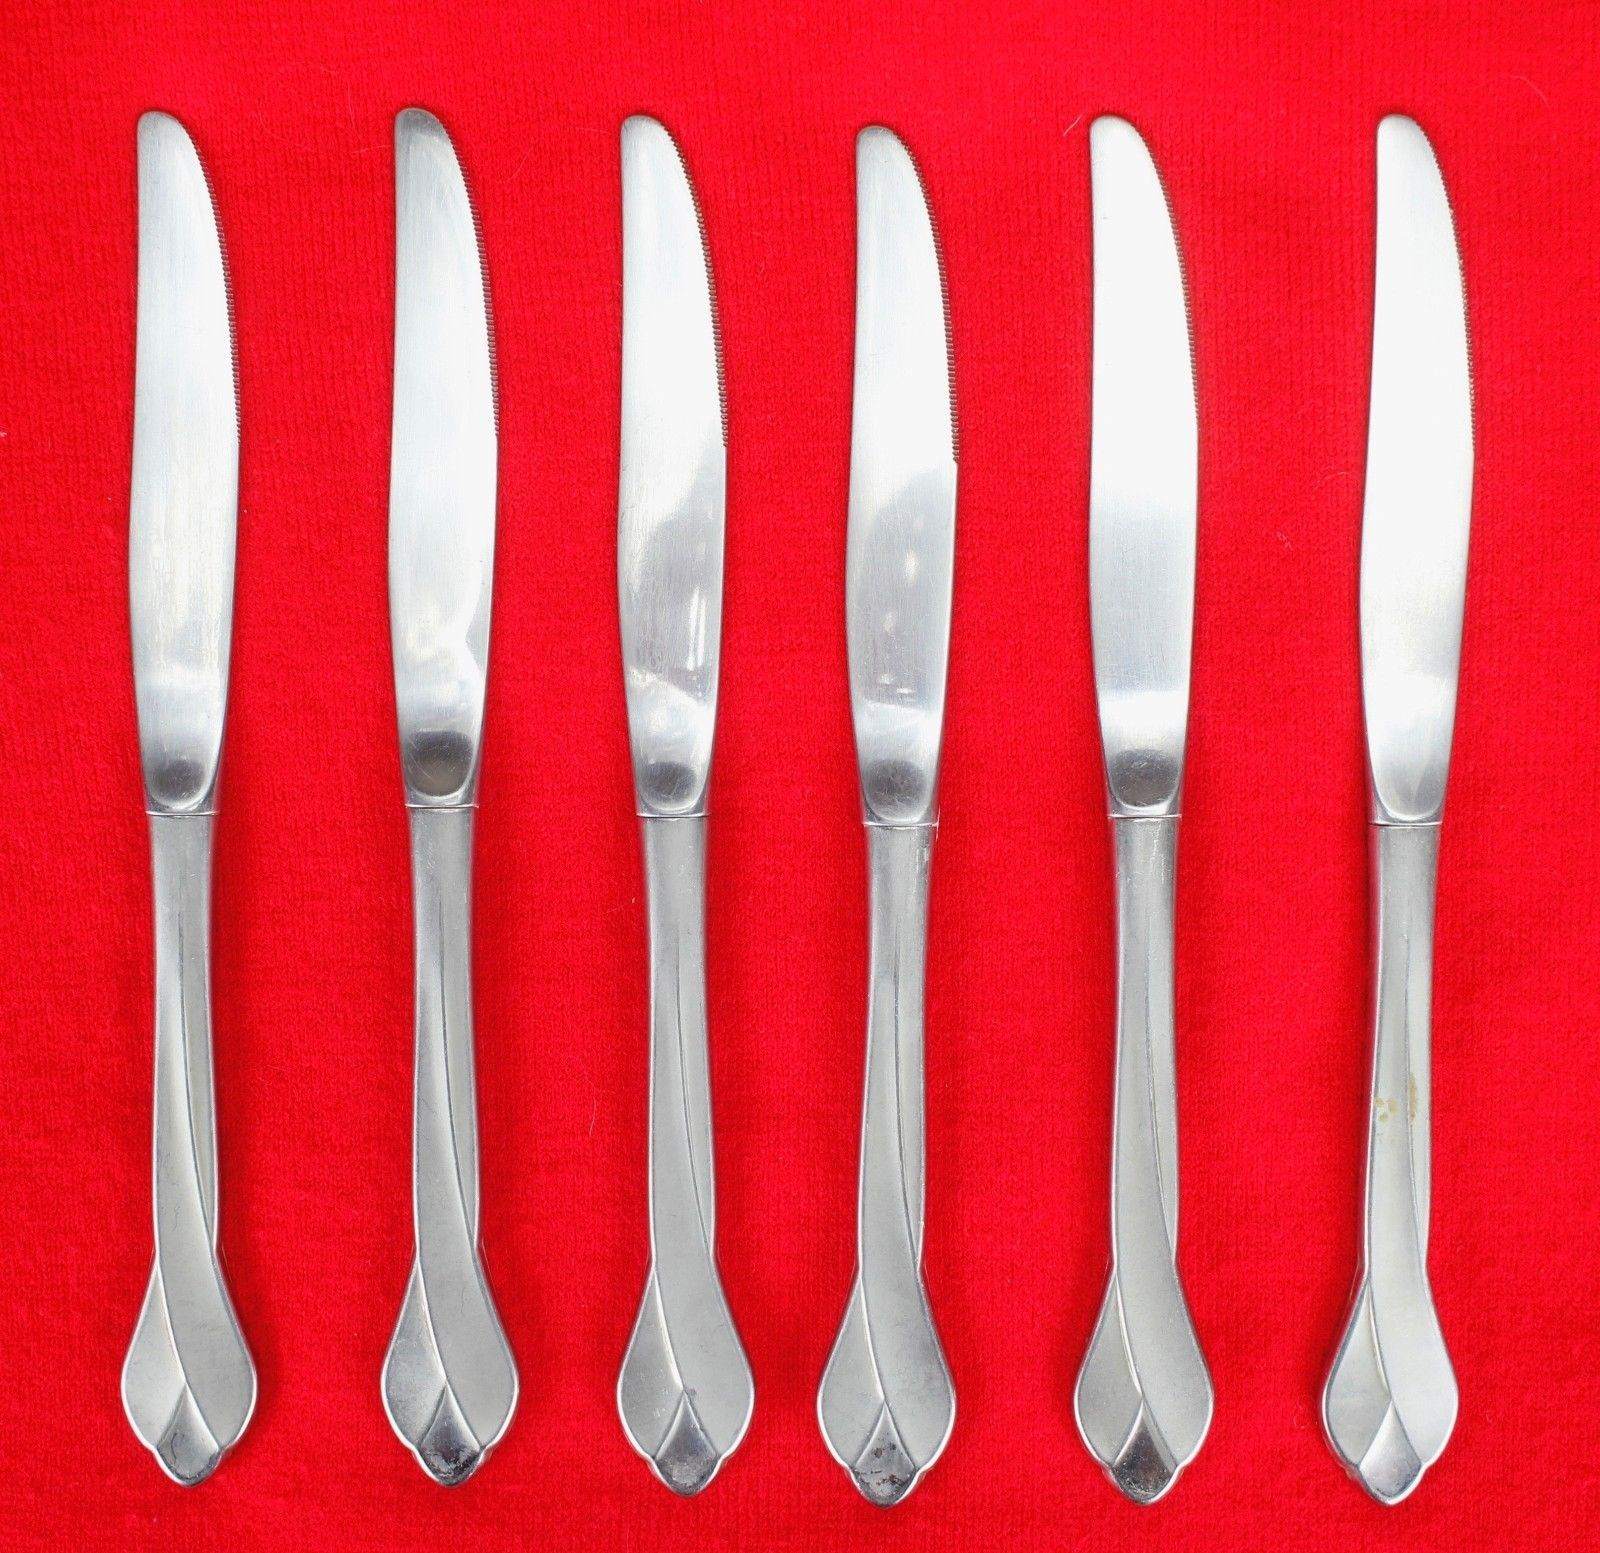 "6X Dinner Table Knives Oneida Tribeca Stainless Glossy Flatware 9"" Knife"